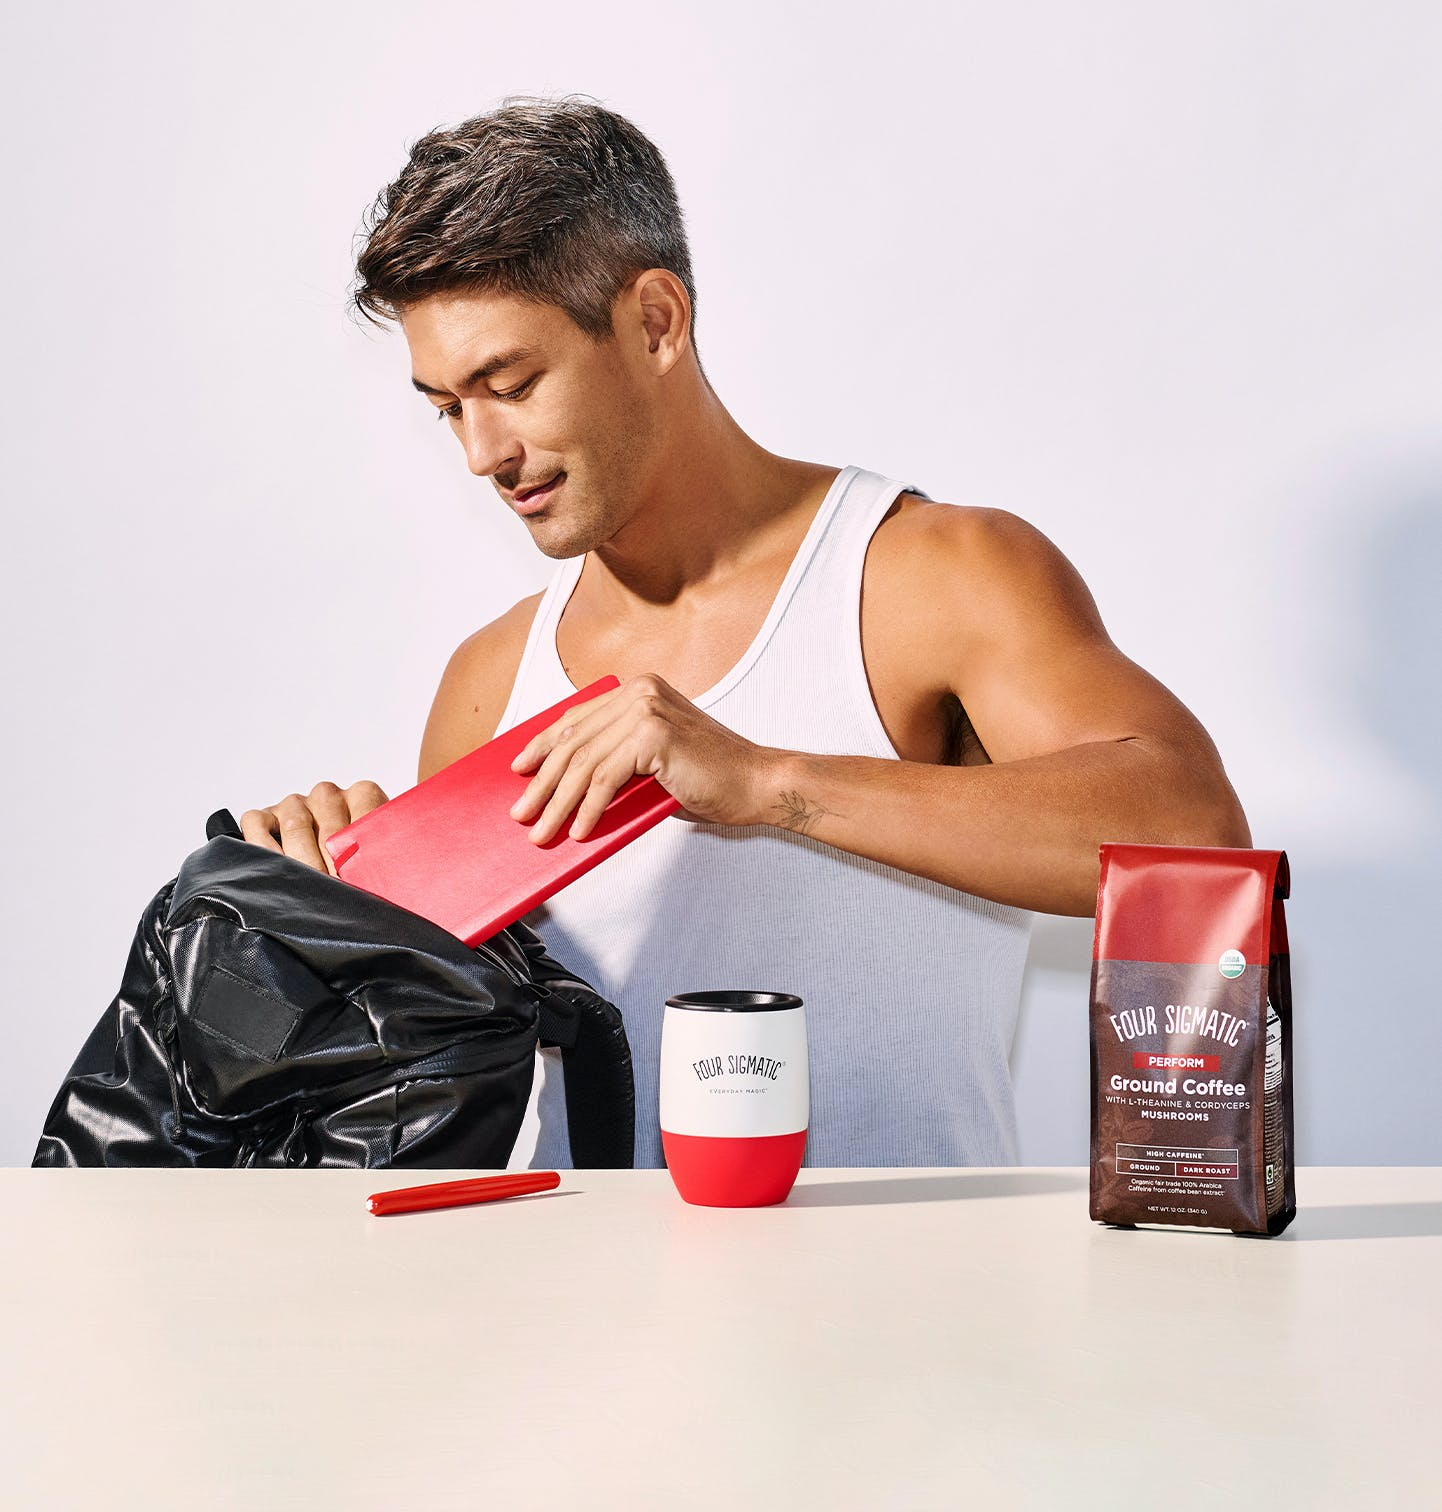 Perform Ground Coffee